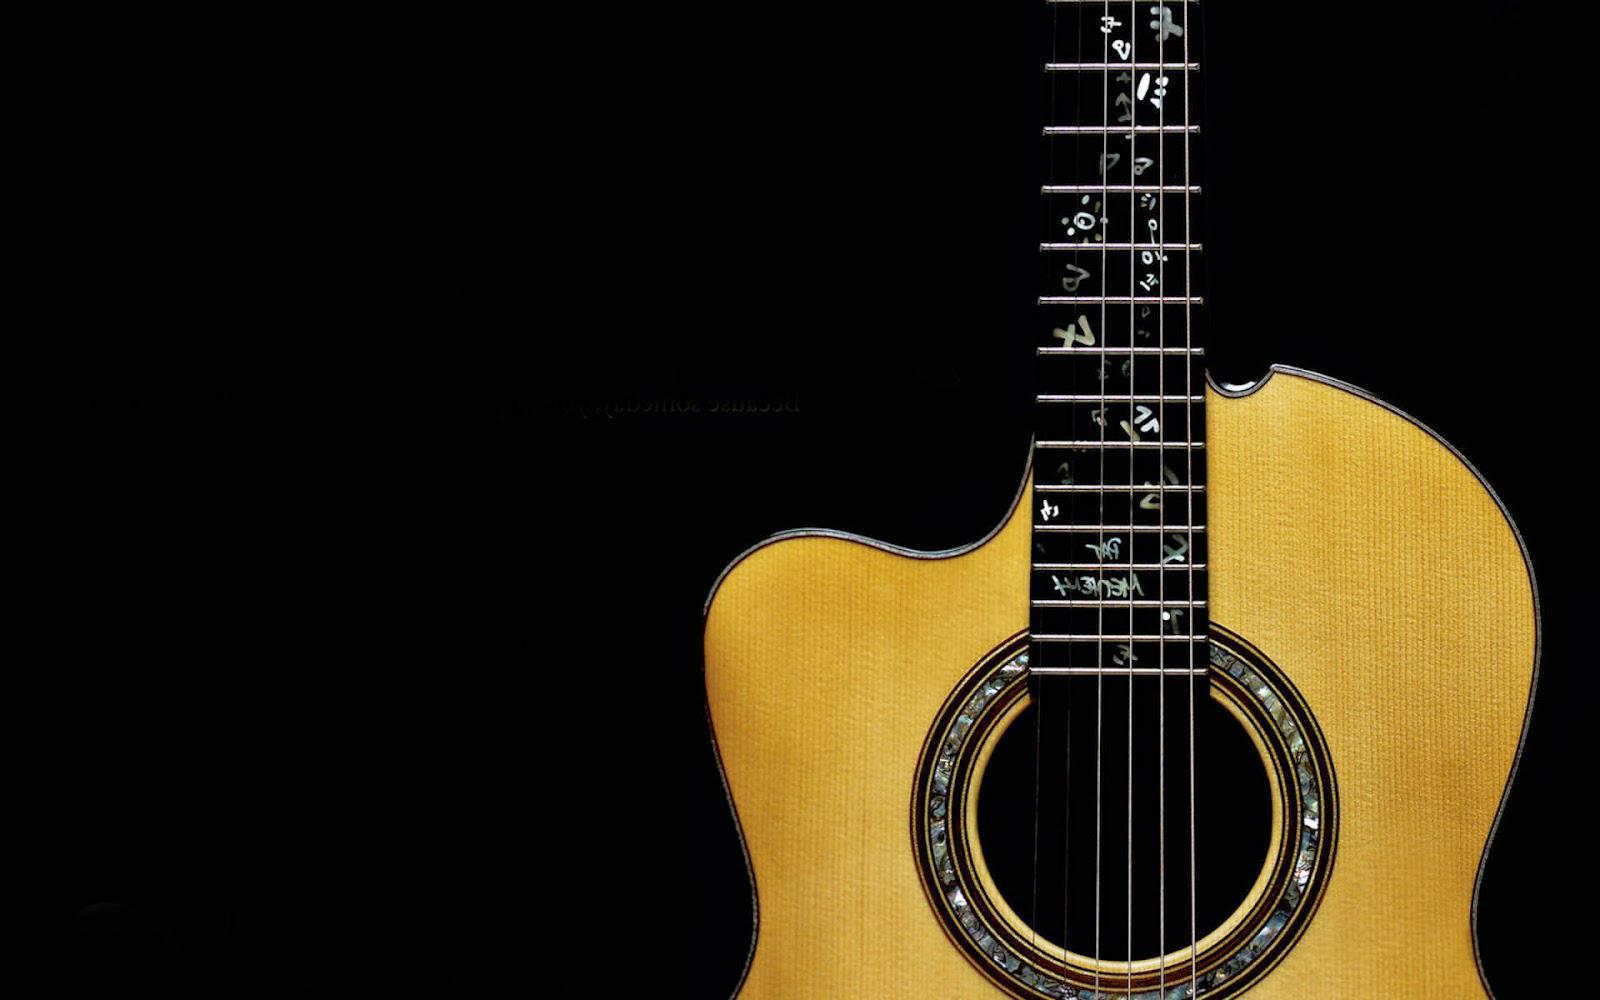 guitar hd wallpaper 2292